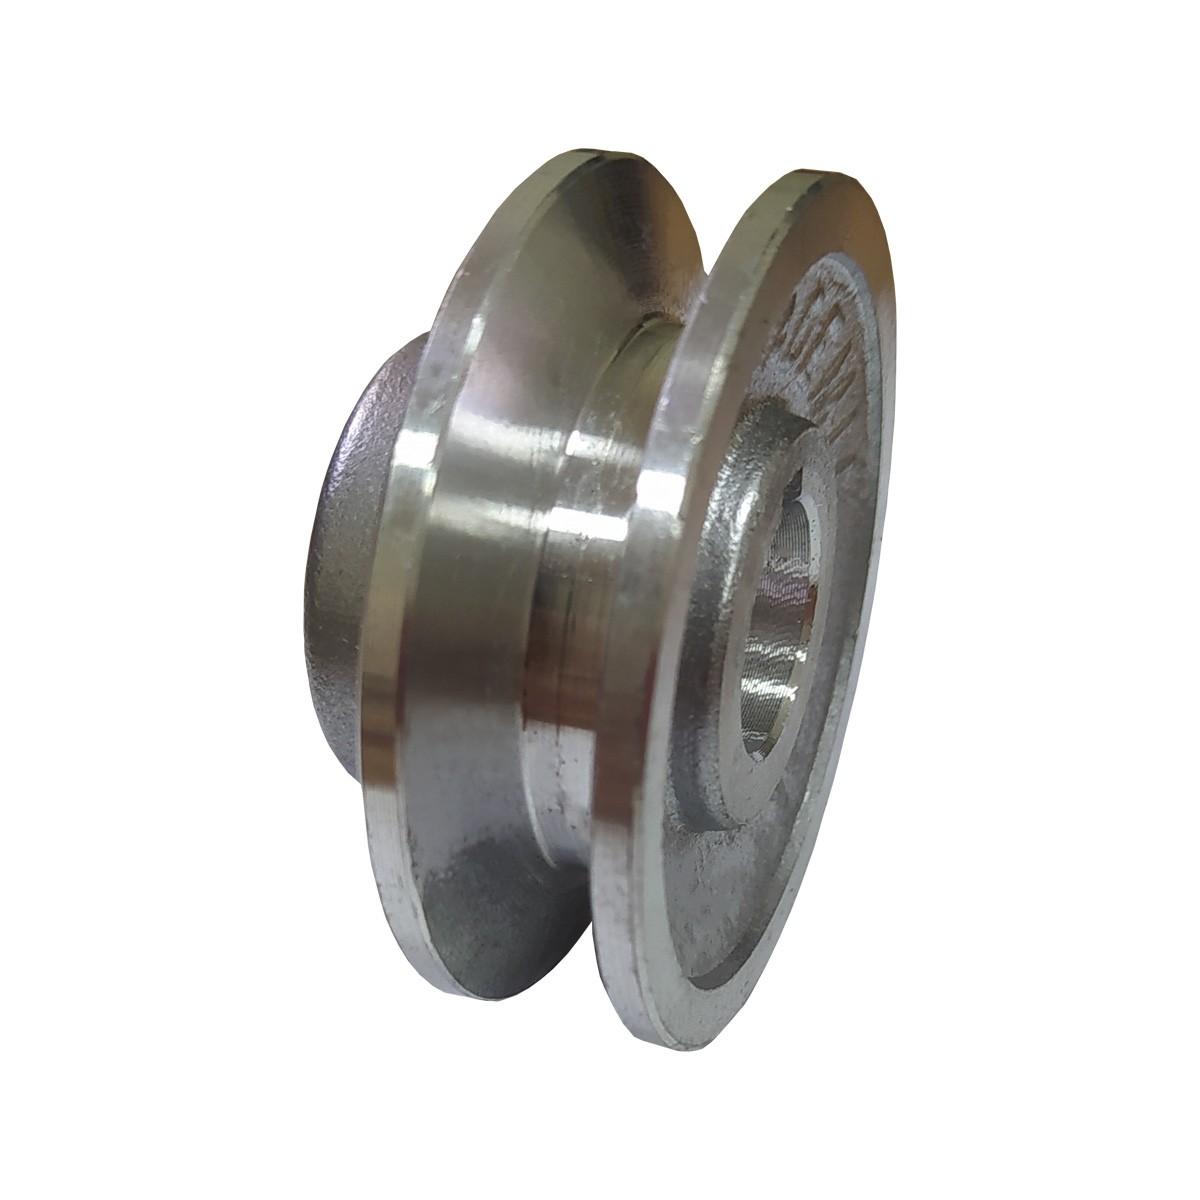 "Polia De Aluminio 50mm Furo 3/4"" 19mm 1 Canal A Chaveta"